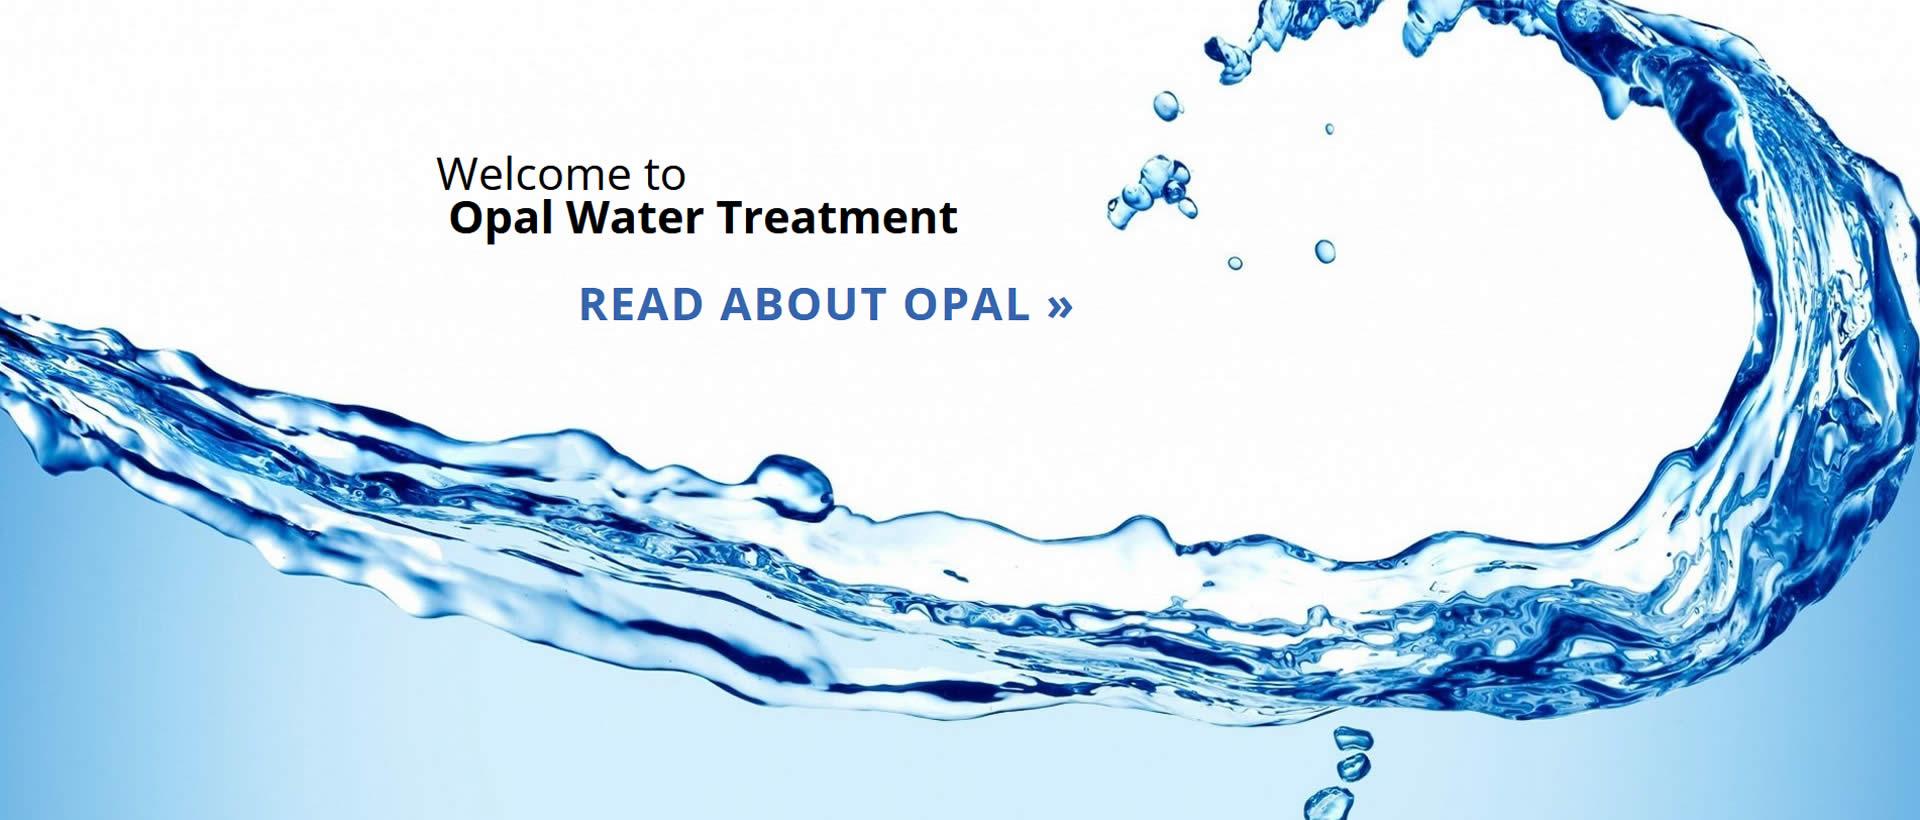 Opal Water Treatments